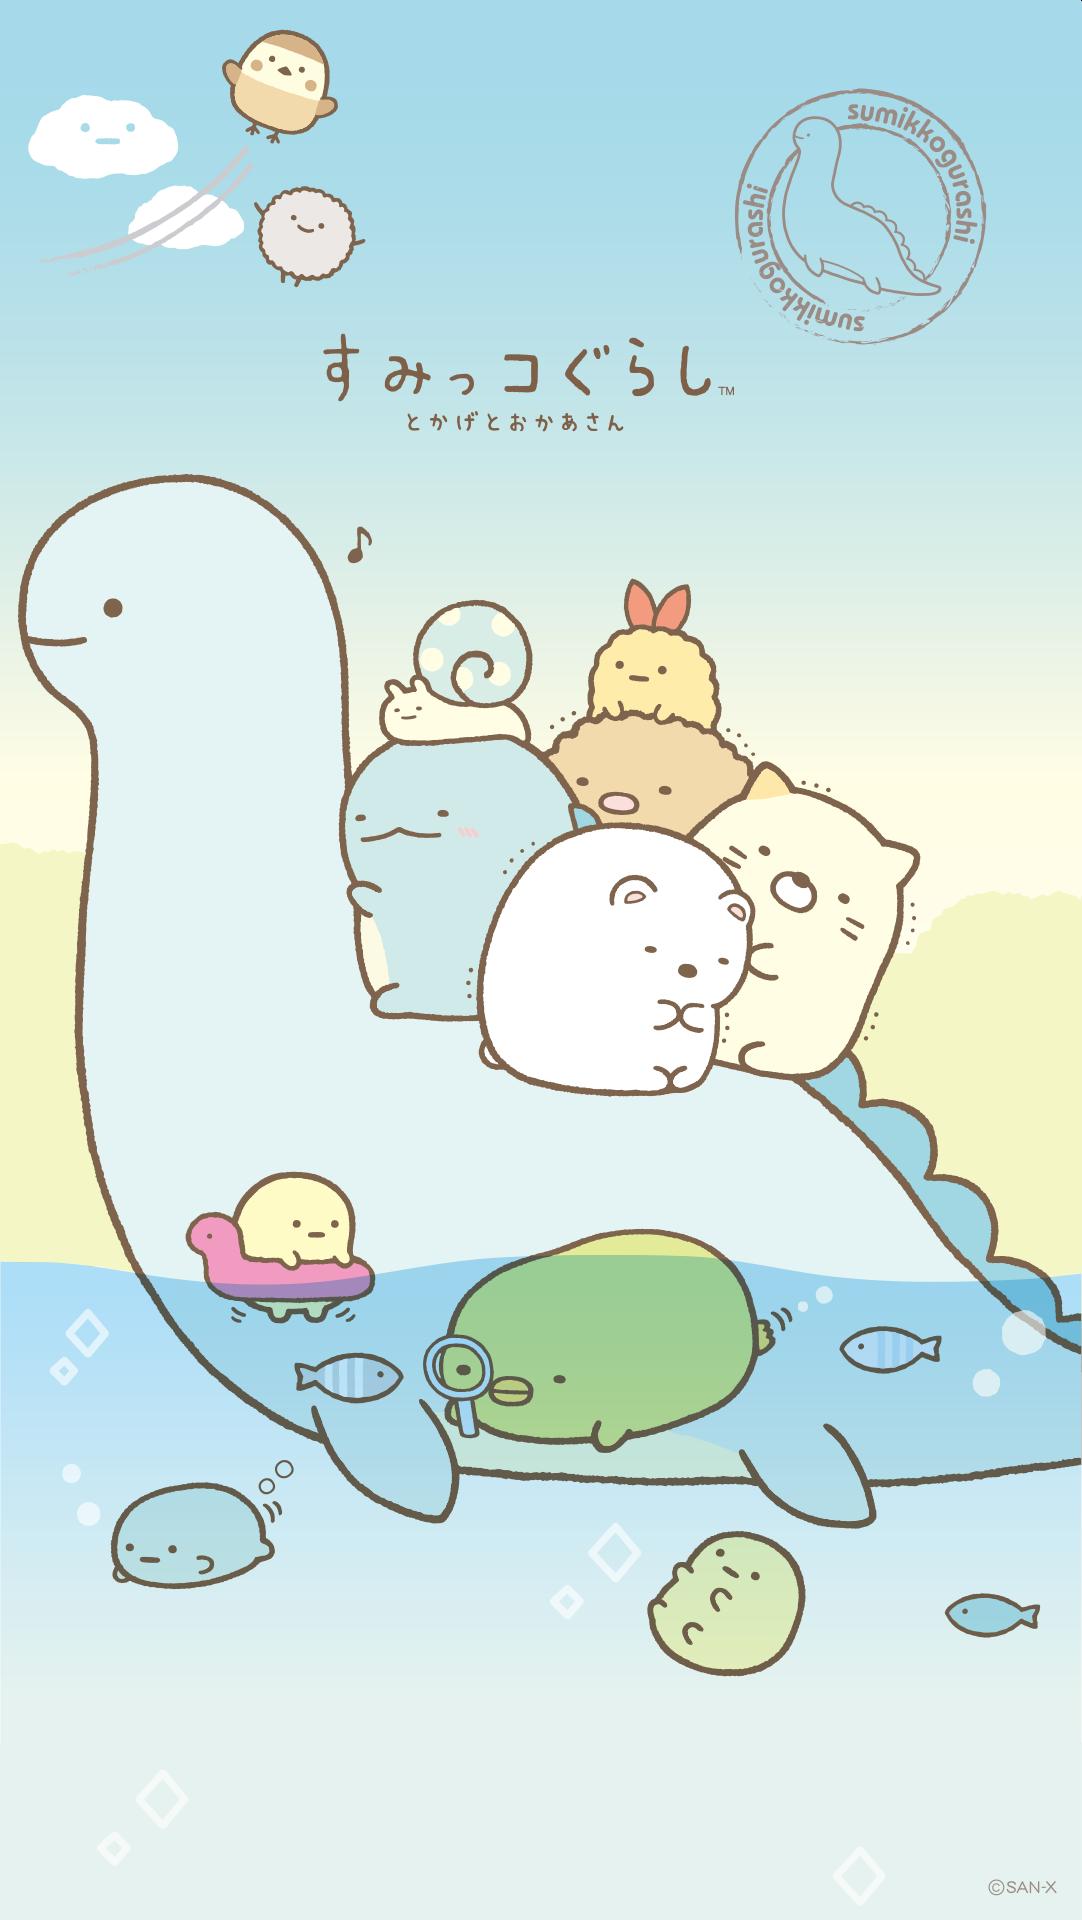 Sumikko gurashi tokage phone wallpaper 640x1136 - Kawaii phone backgrounds ...